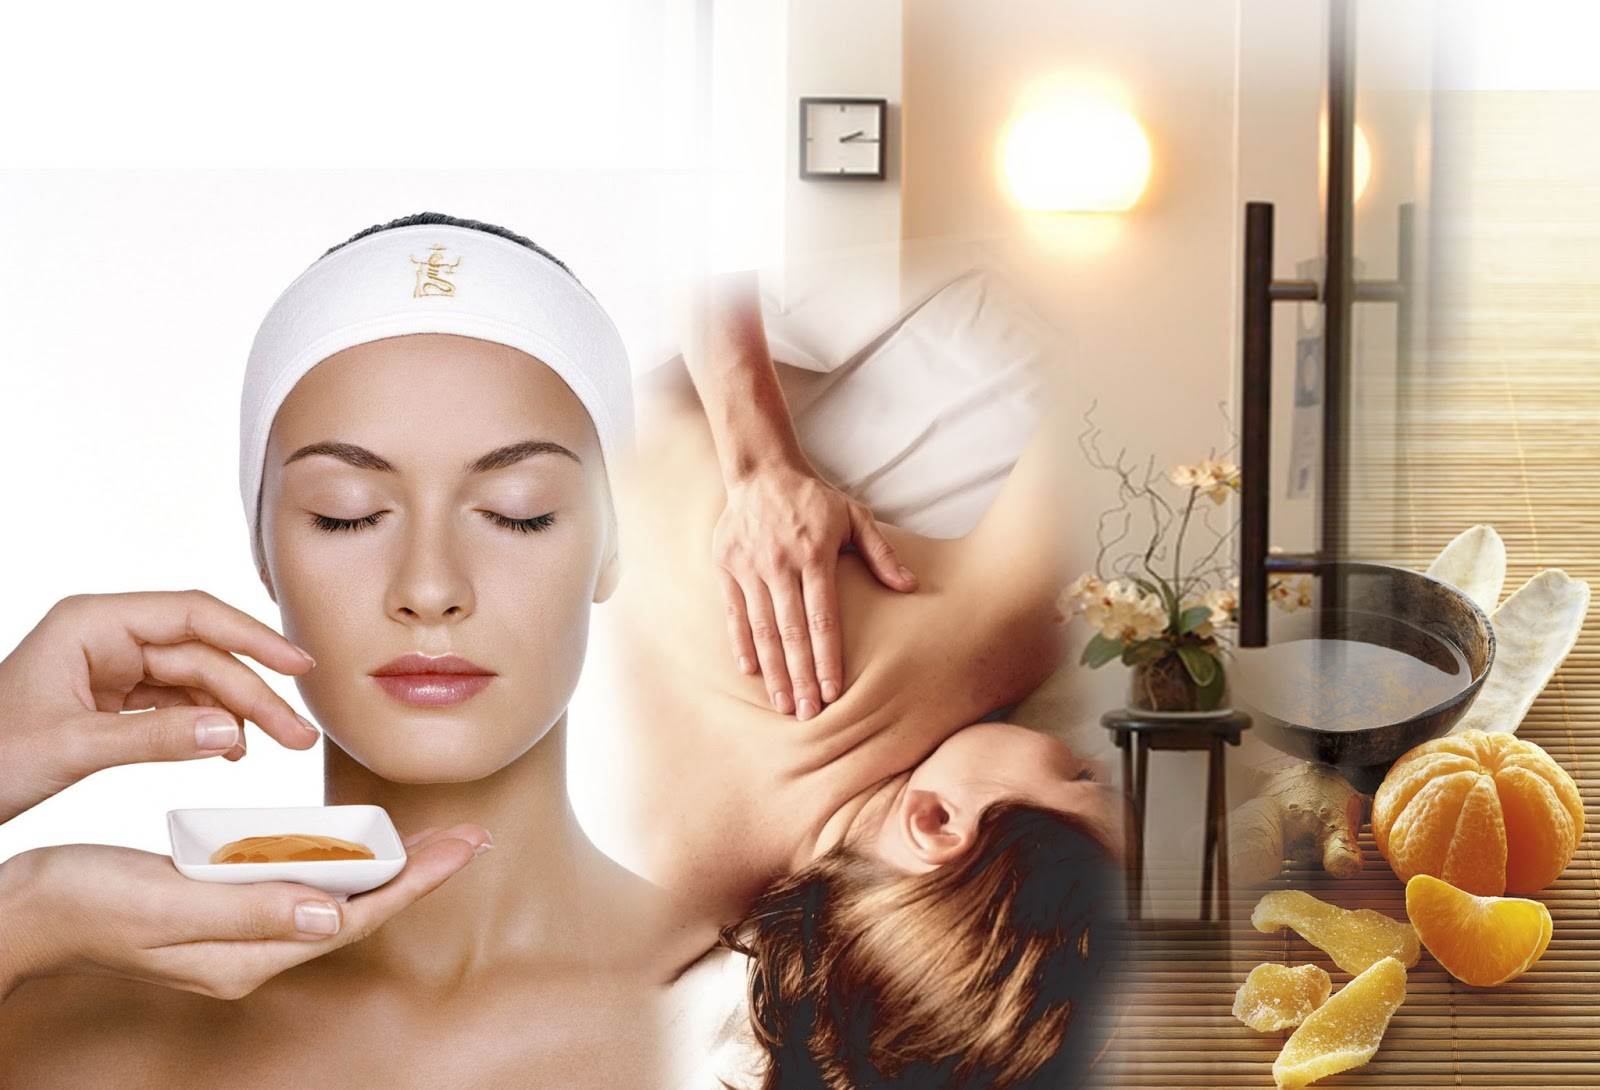 thaimassage hornstull massage st eriksplan